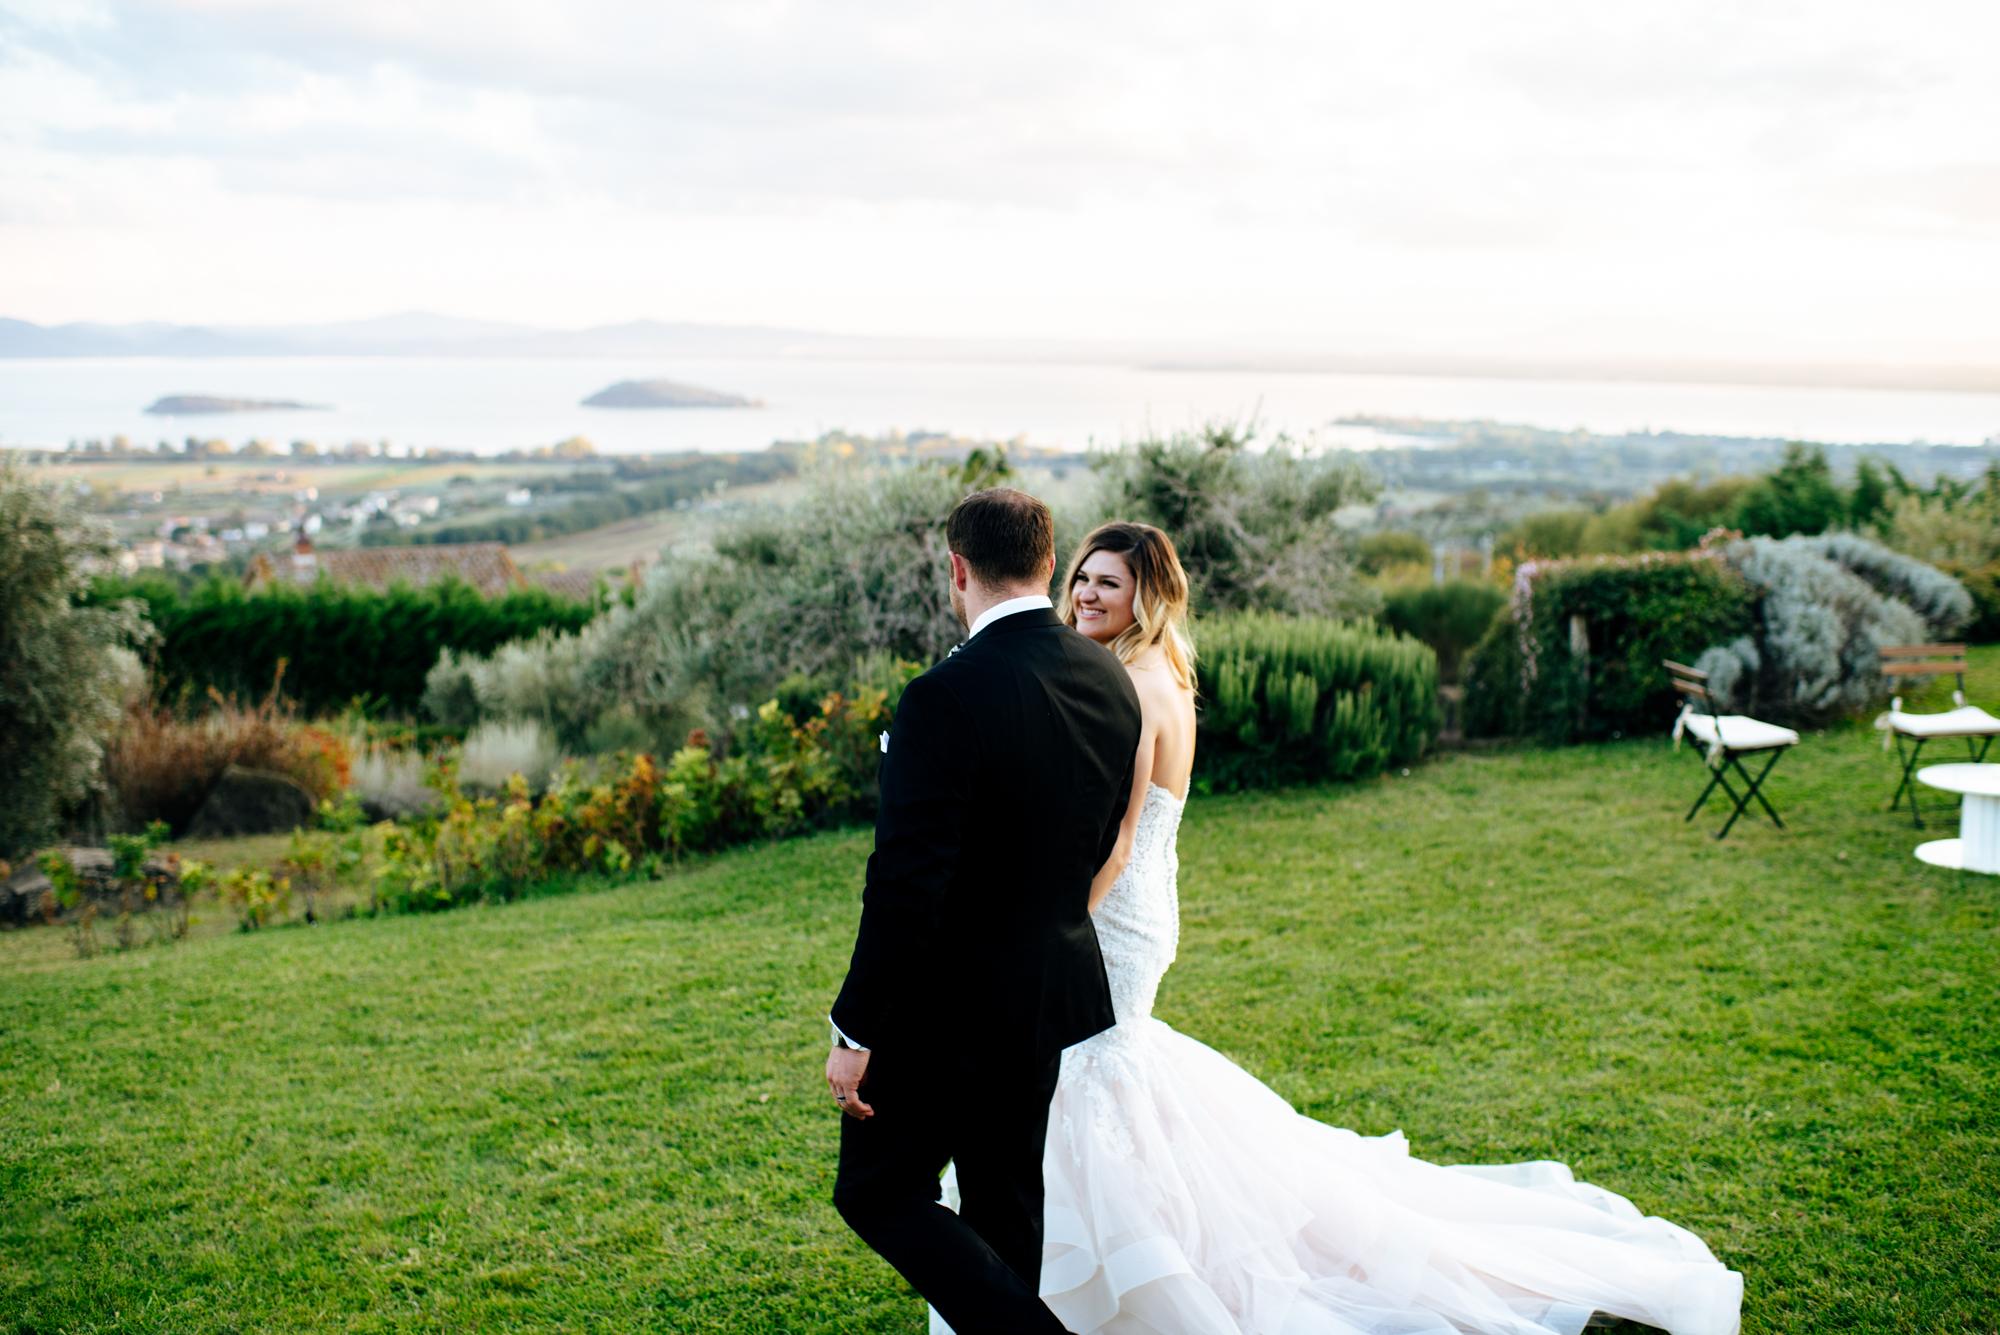 SamErica Studios - Cortona Italy Wedding -  Modern Destination Wedding photographers - italy wedding portraits